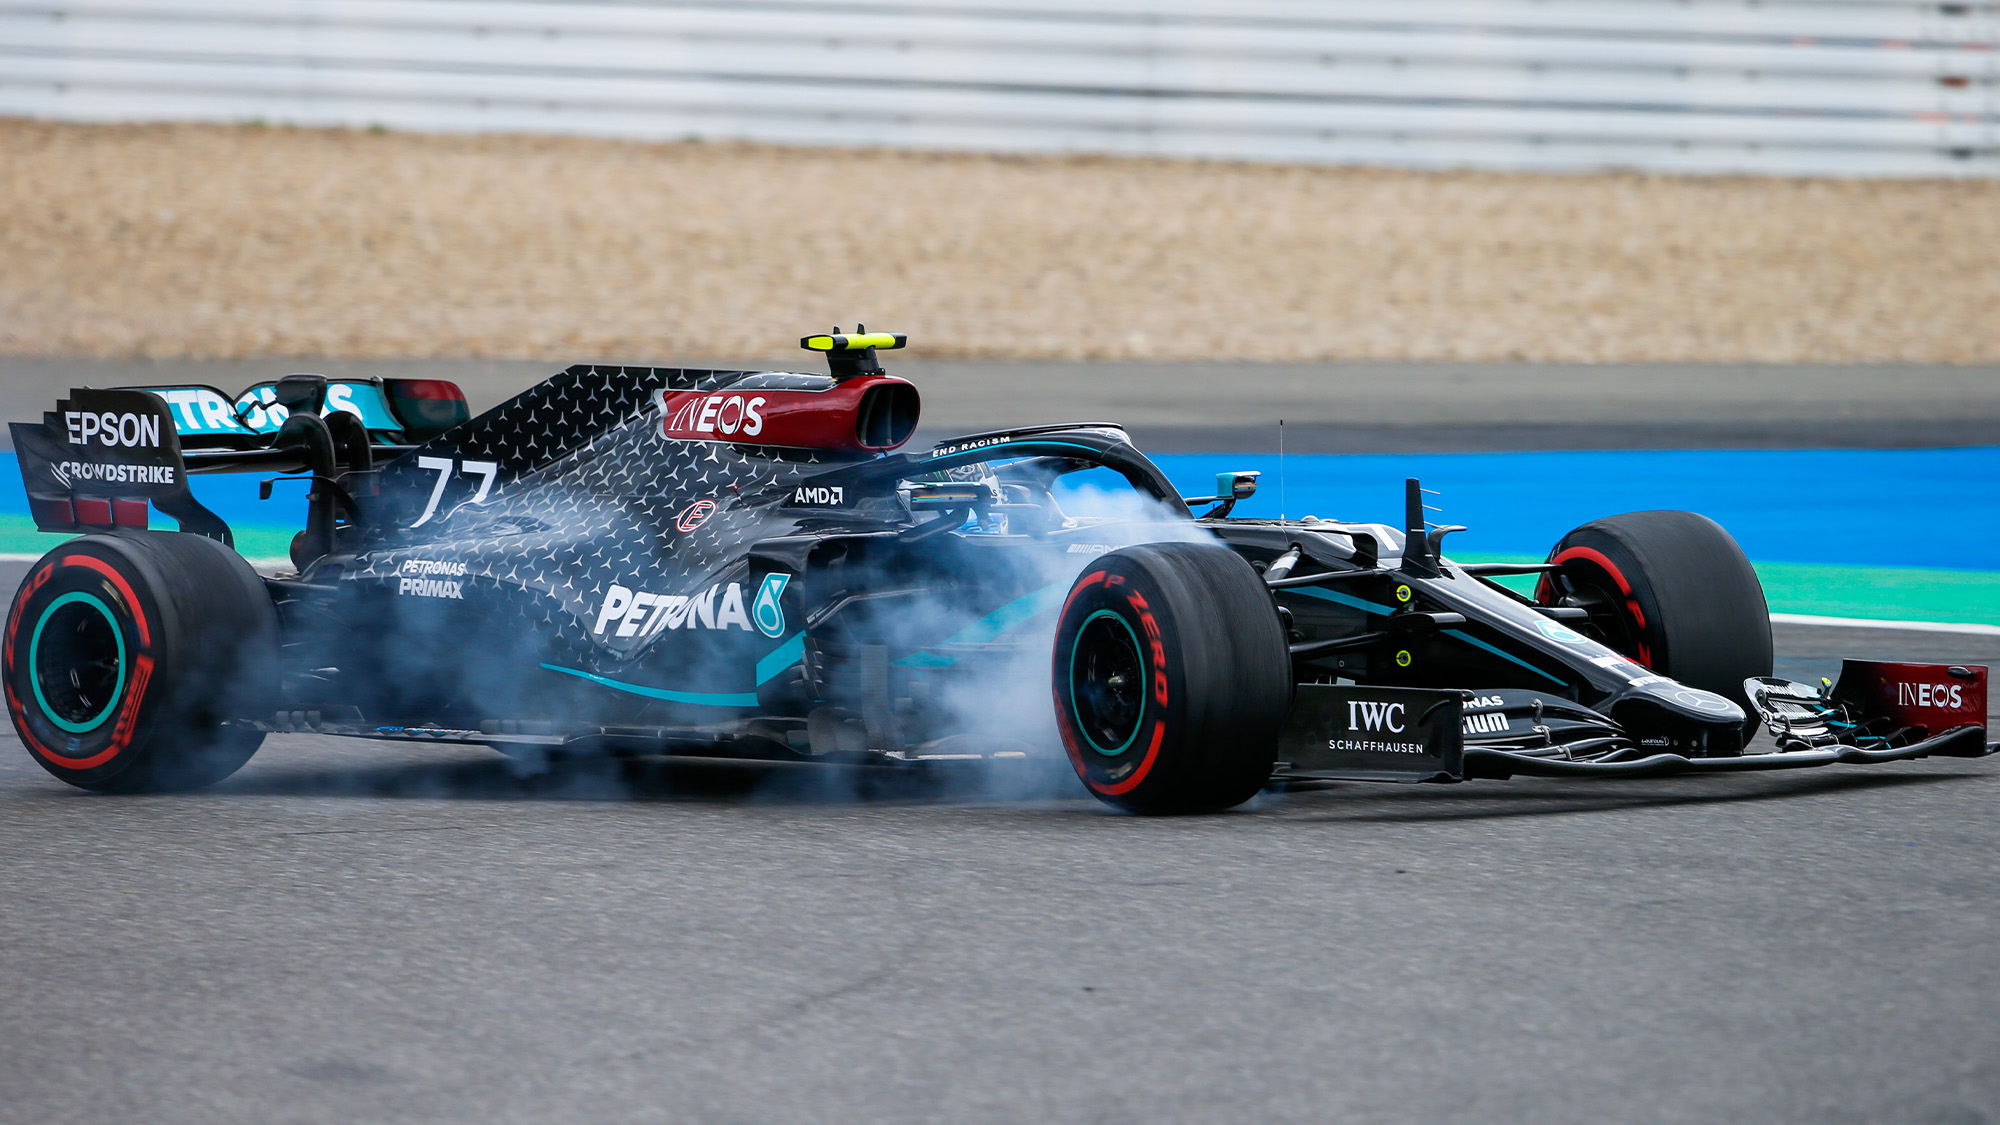 Valtteri Bottas locks up at the Nurbirgring during the 2020 f1 Eifel Grand Prix